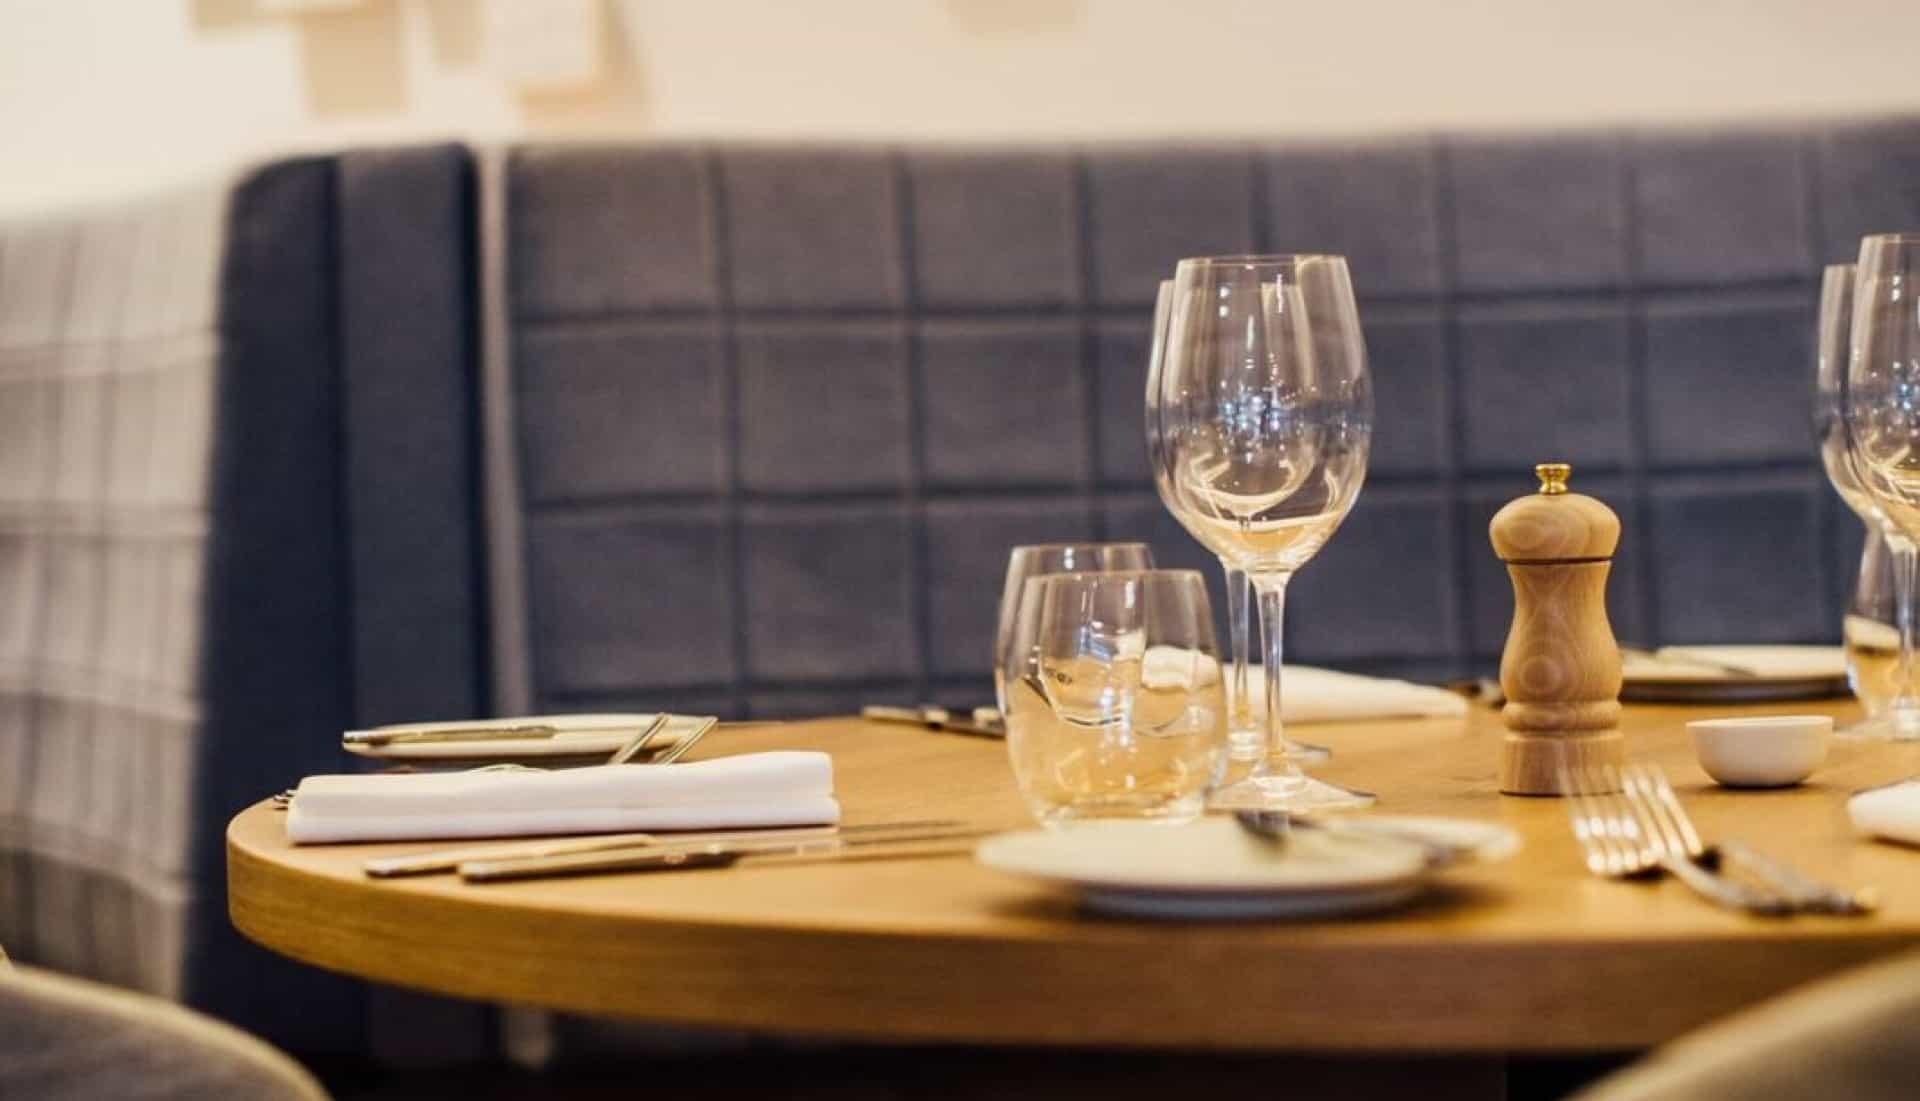 Euro restaurant in Auckland dining table design